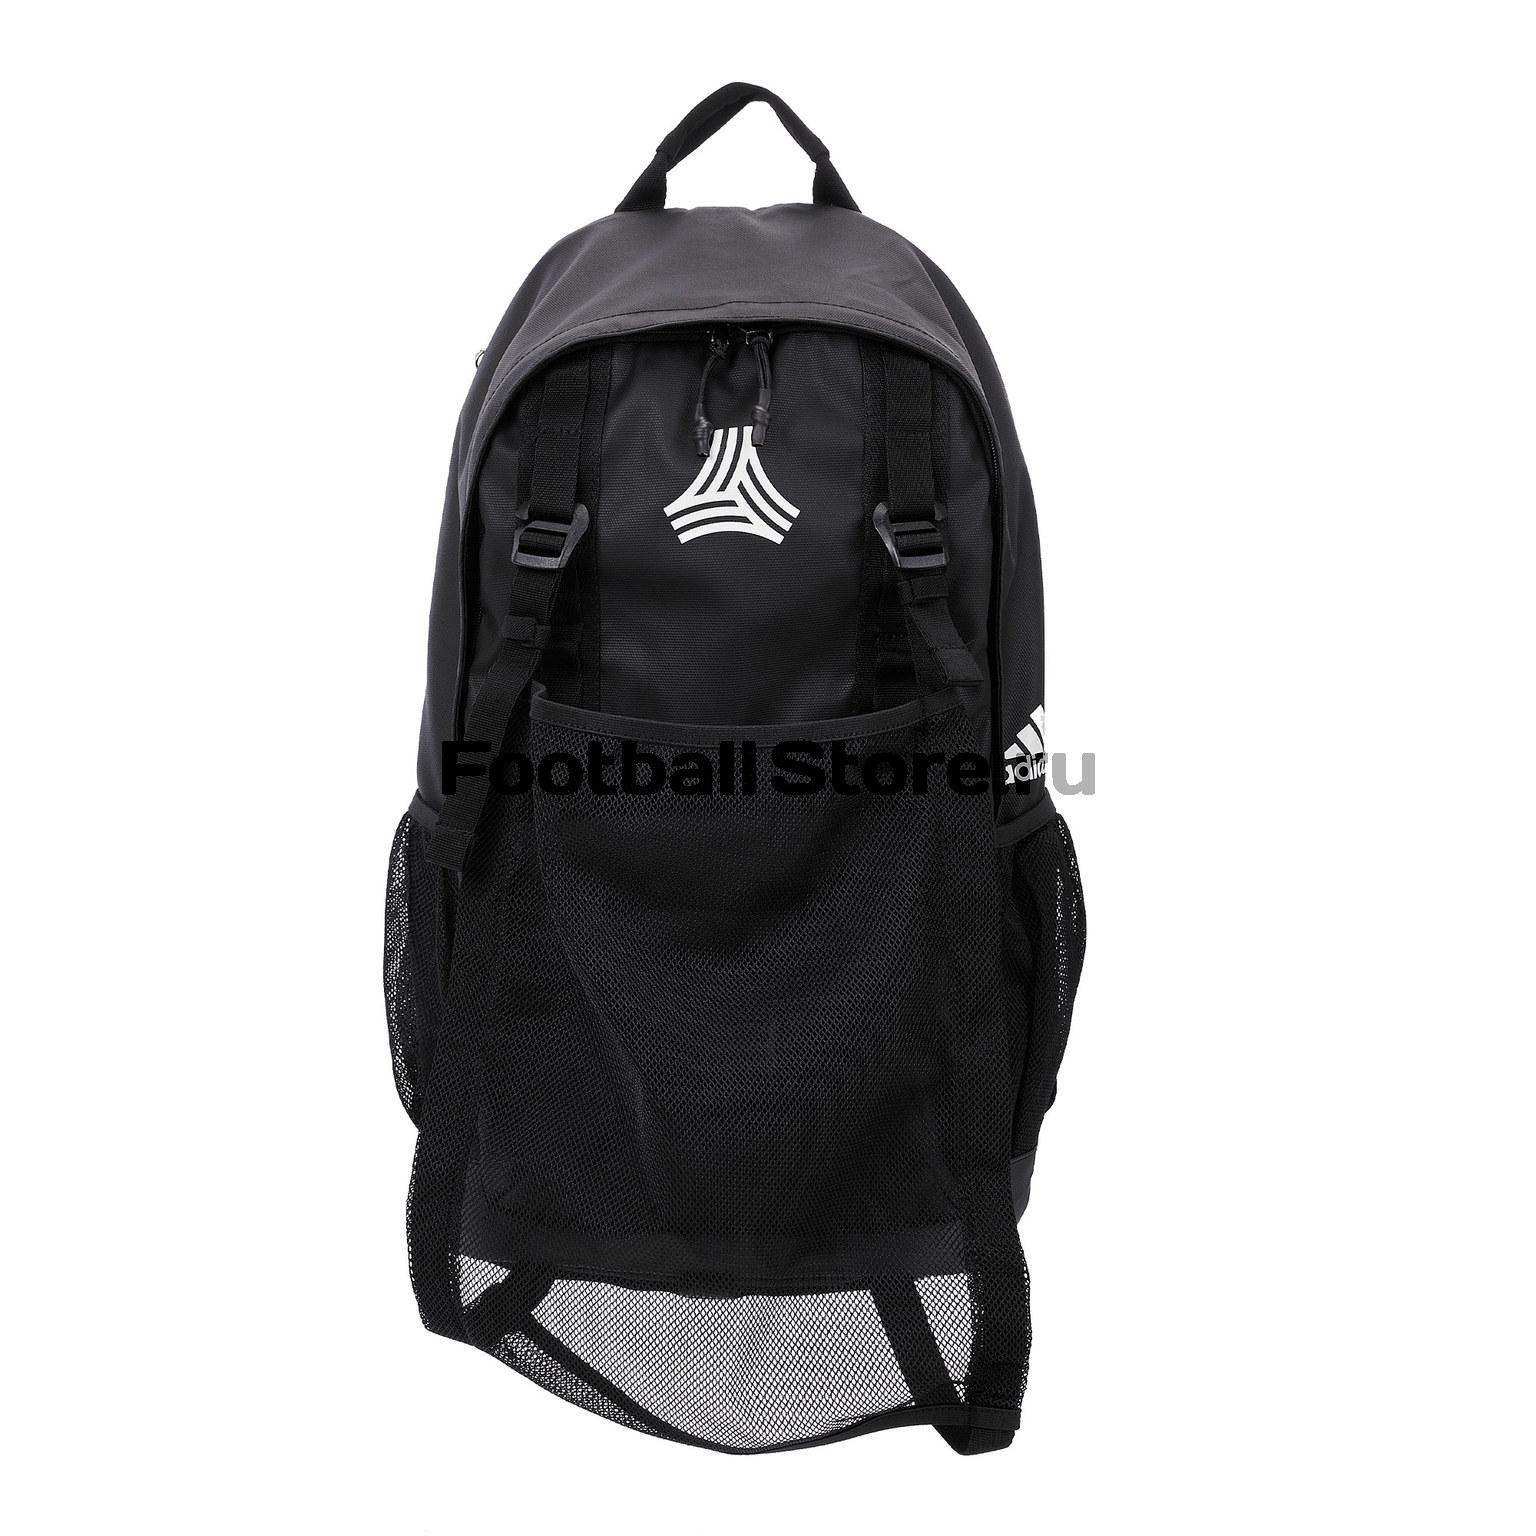 Рюкзак Adidas Football Street DT5142 съемная ручка redmond ram cl2